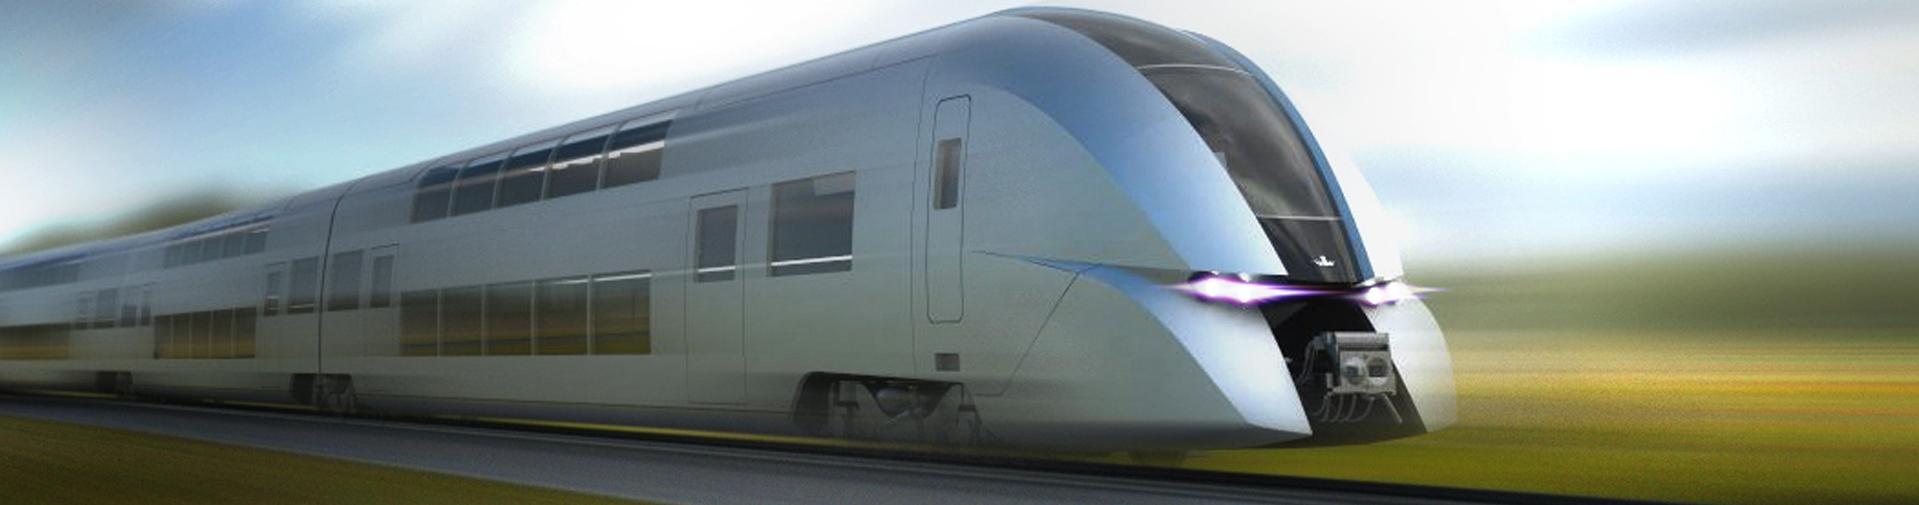 train exter01